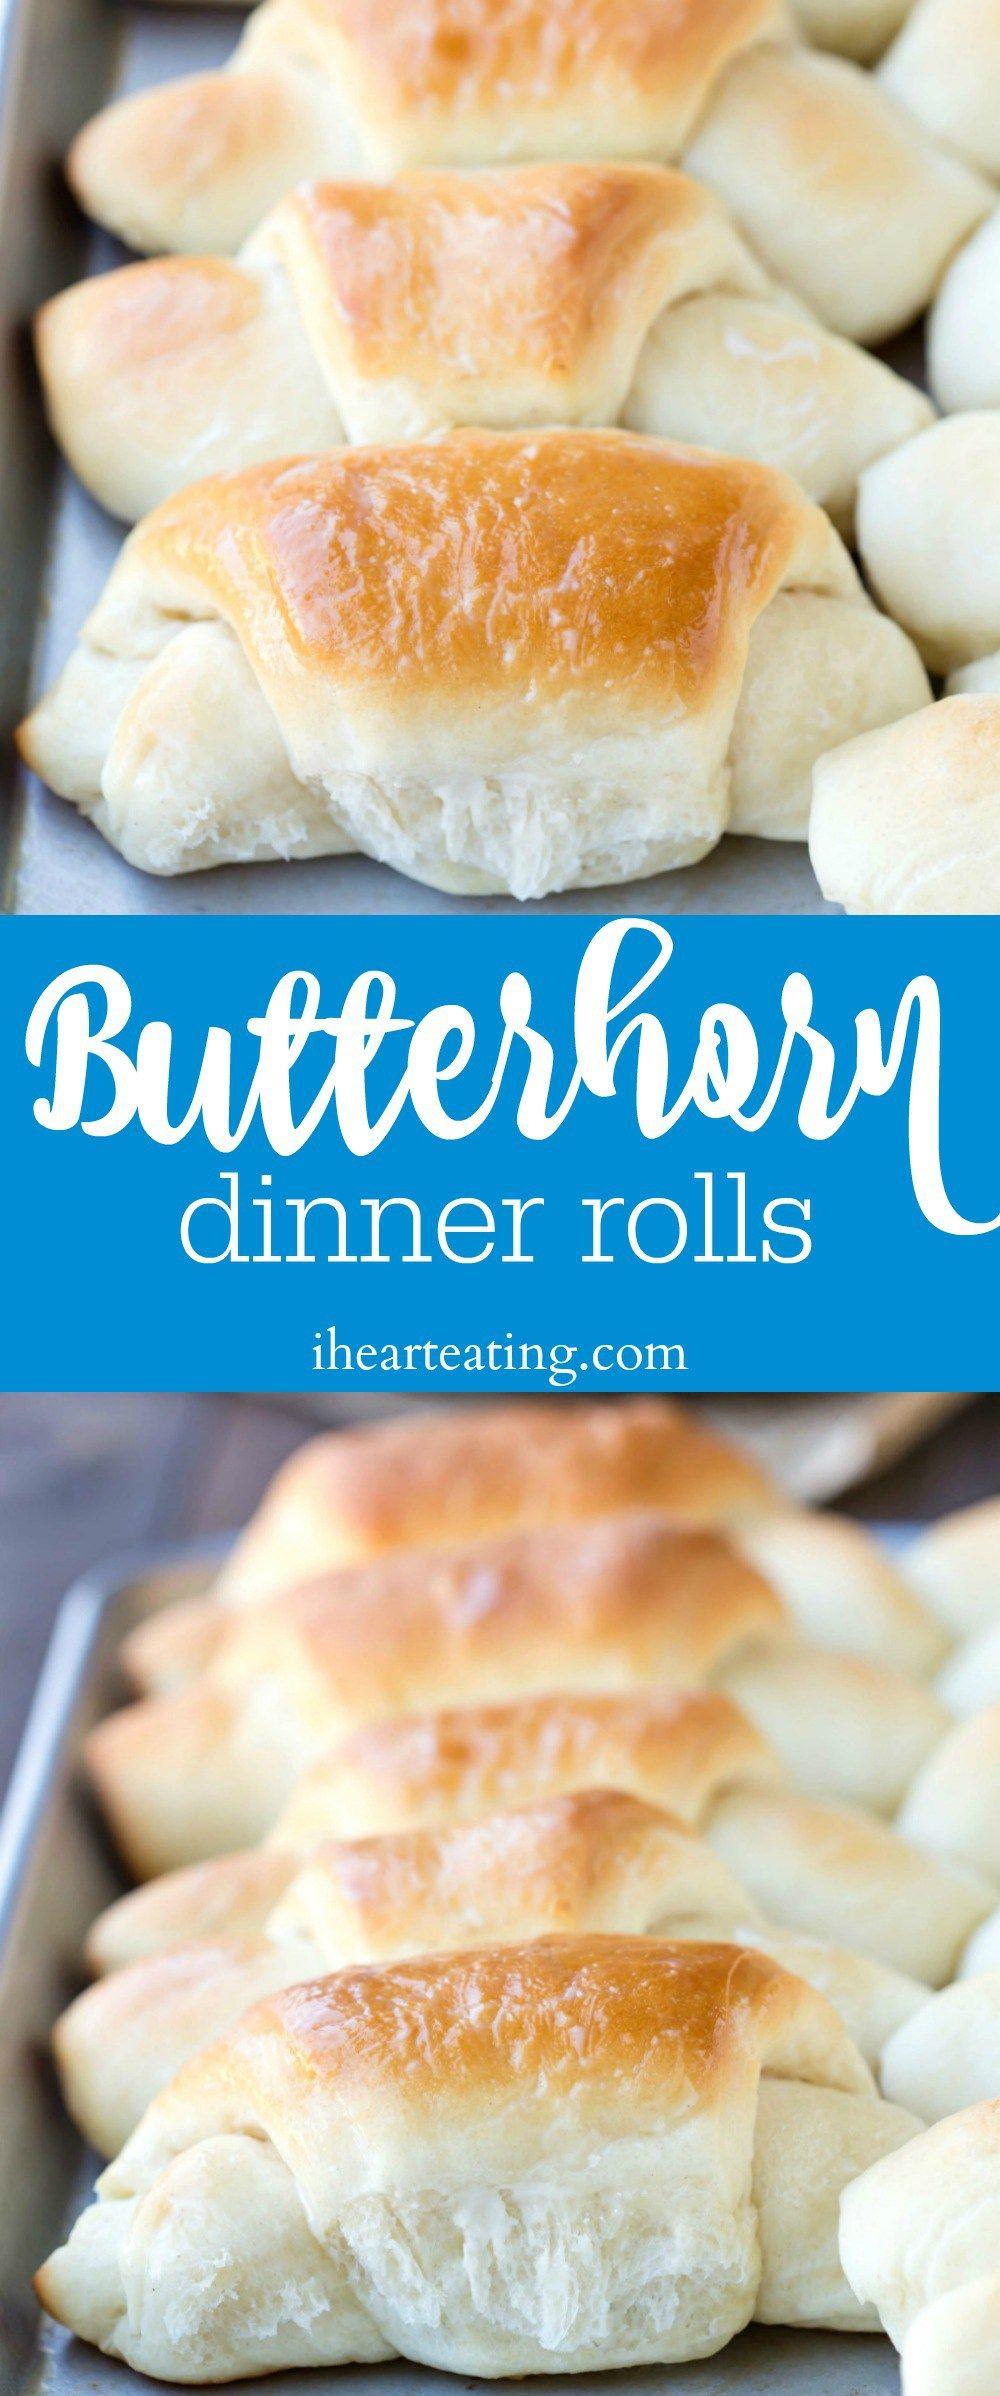 Butterhorn Dinner Roll Recipe I Heart Eating Pinterest